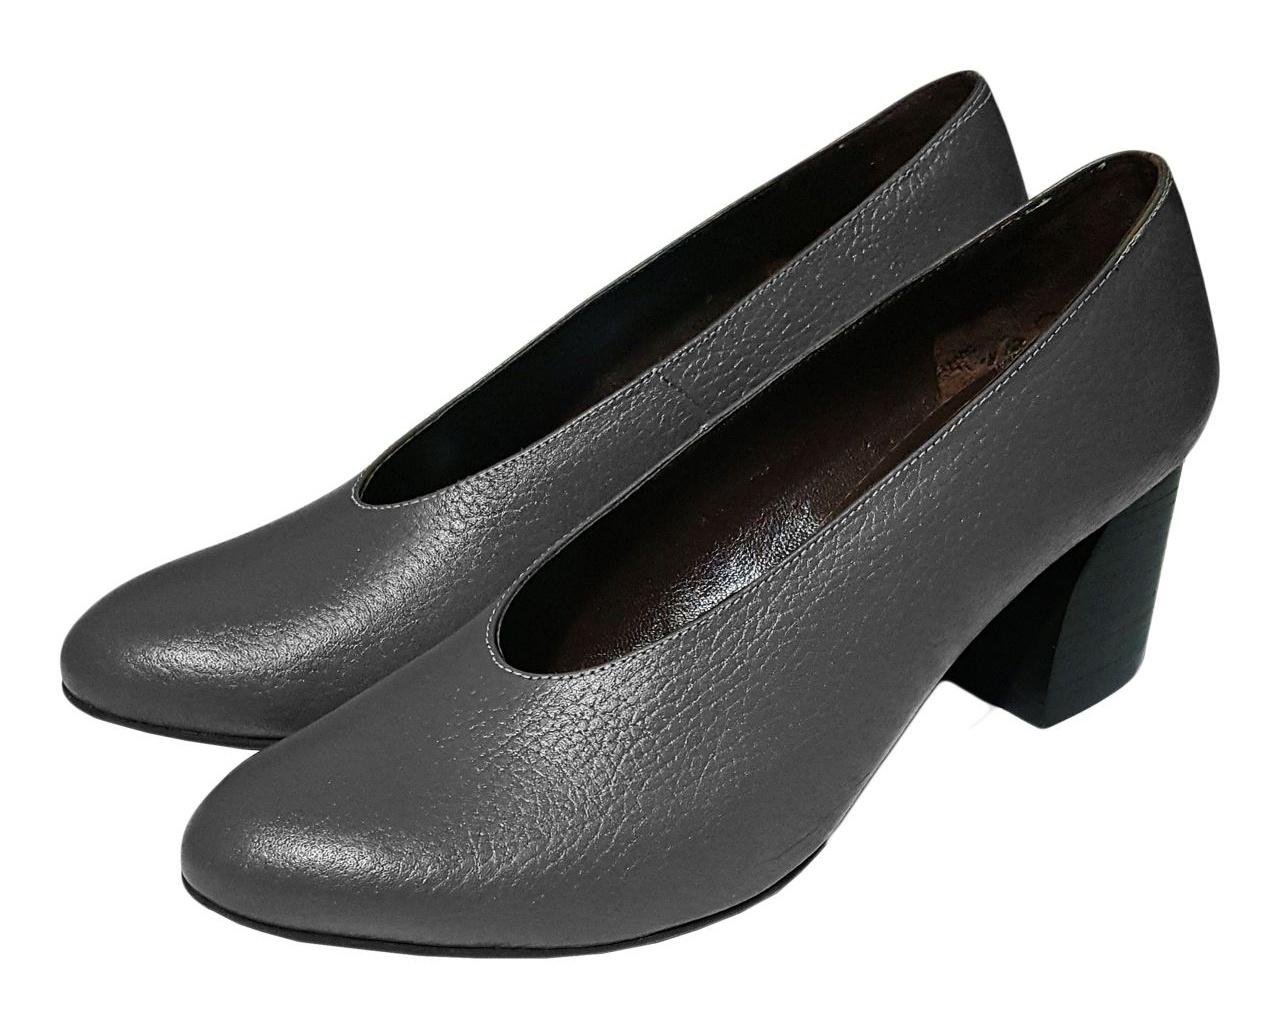 کفش زنانه کد 1104-2